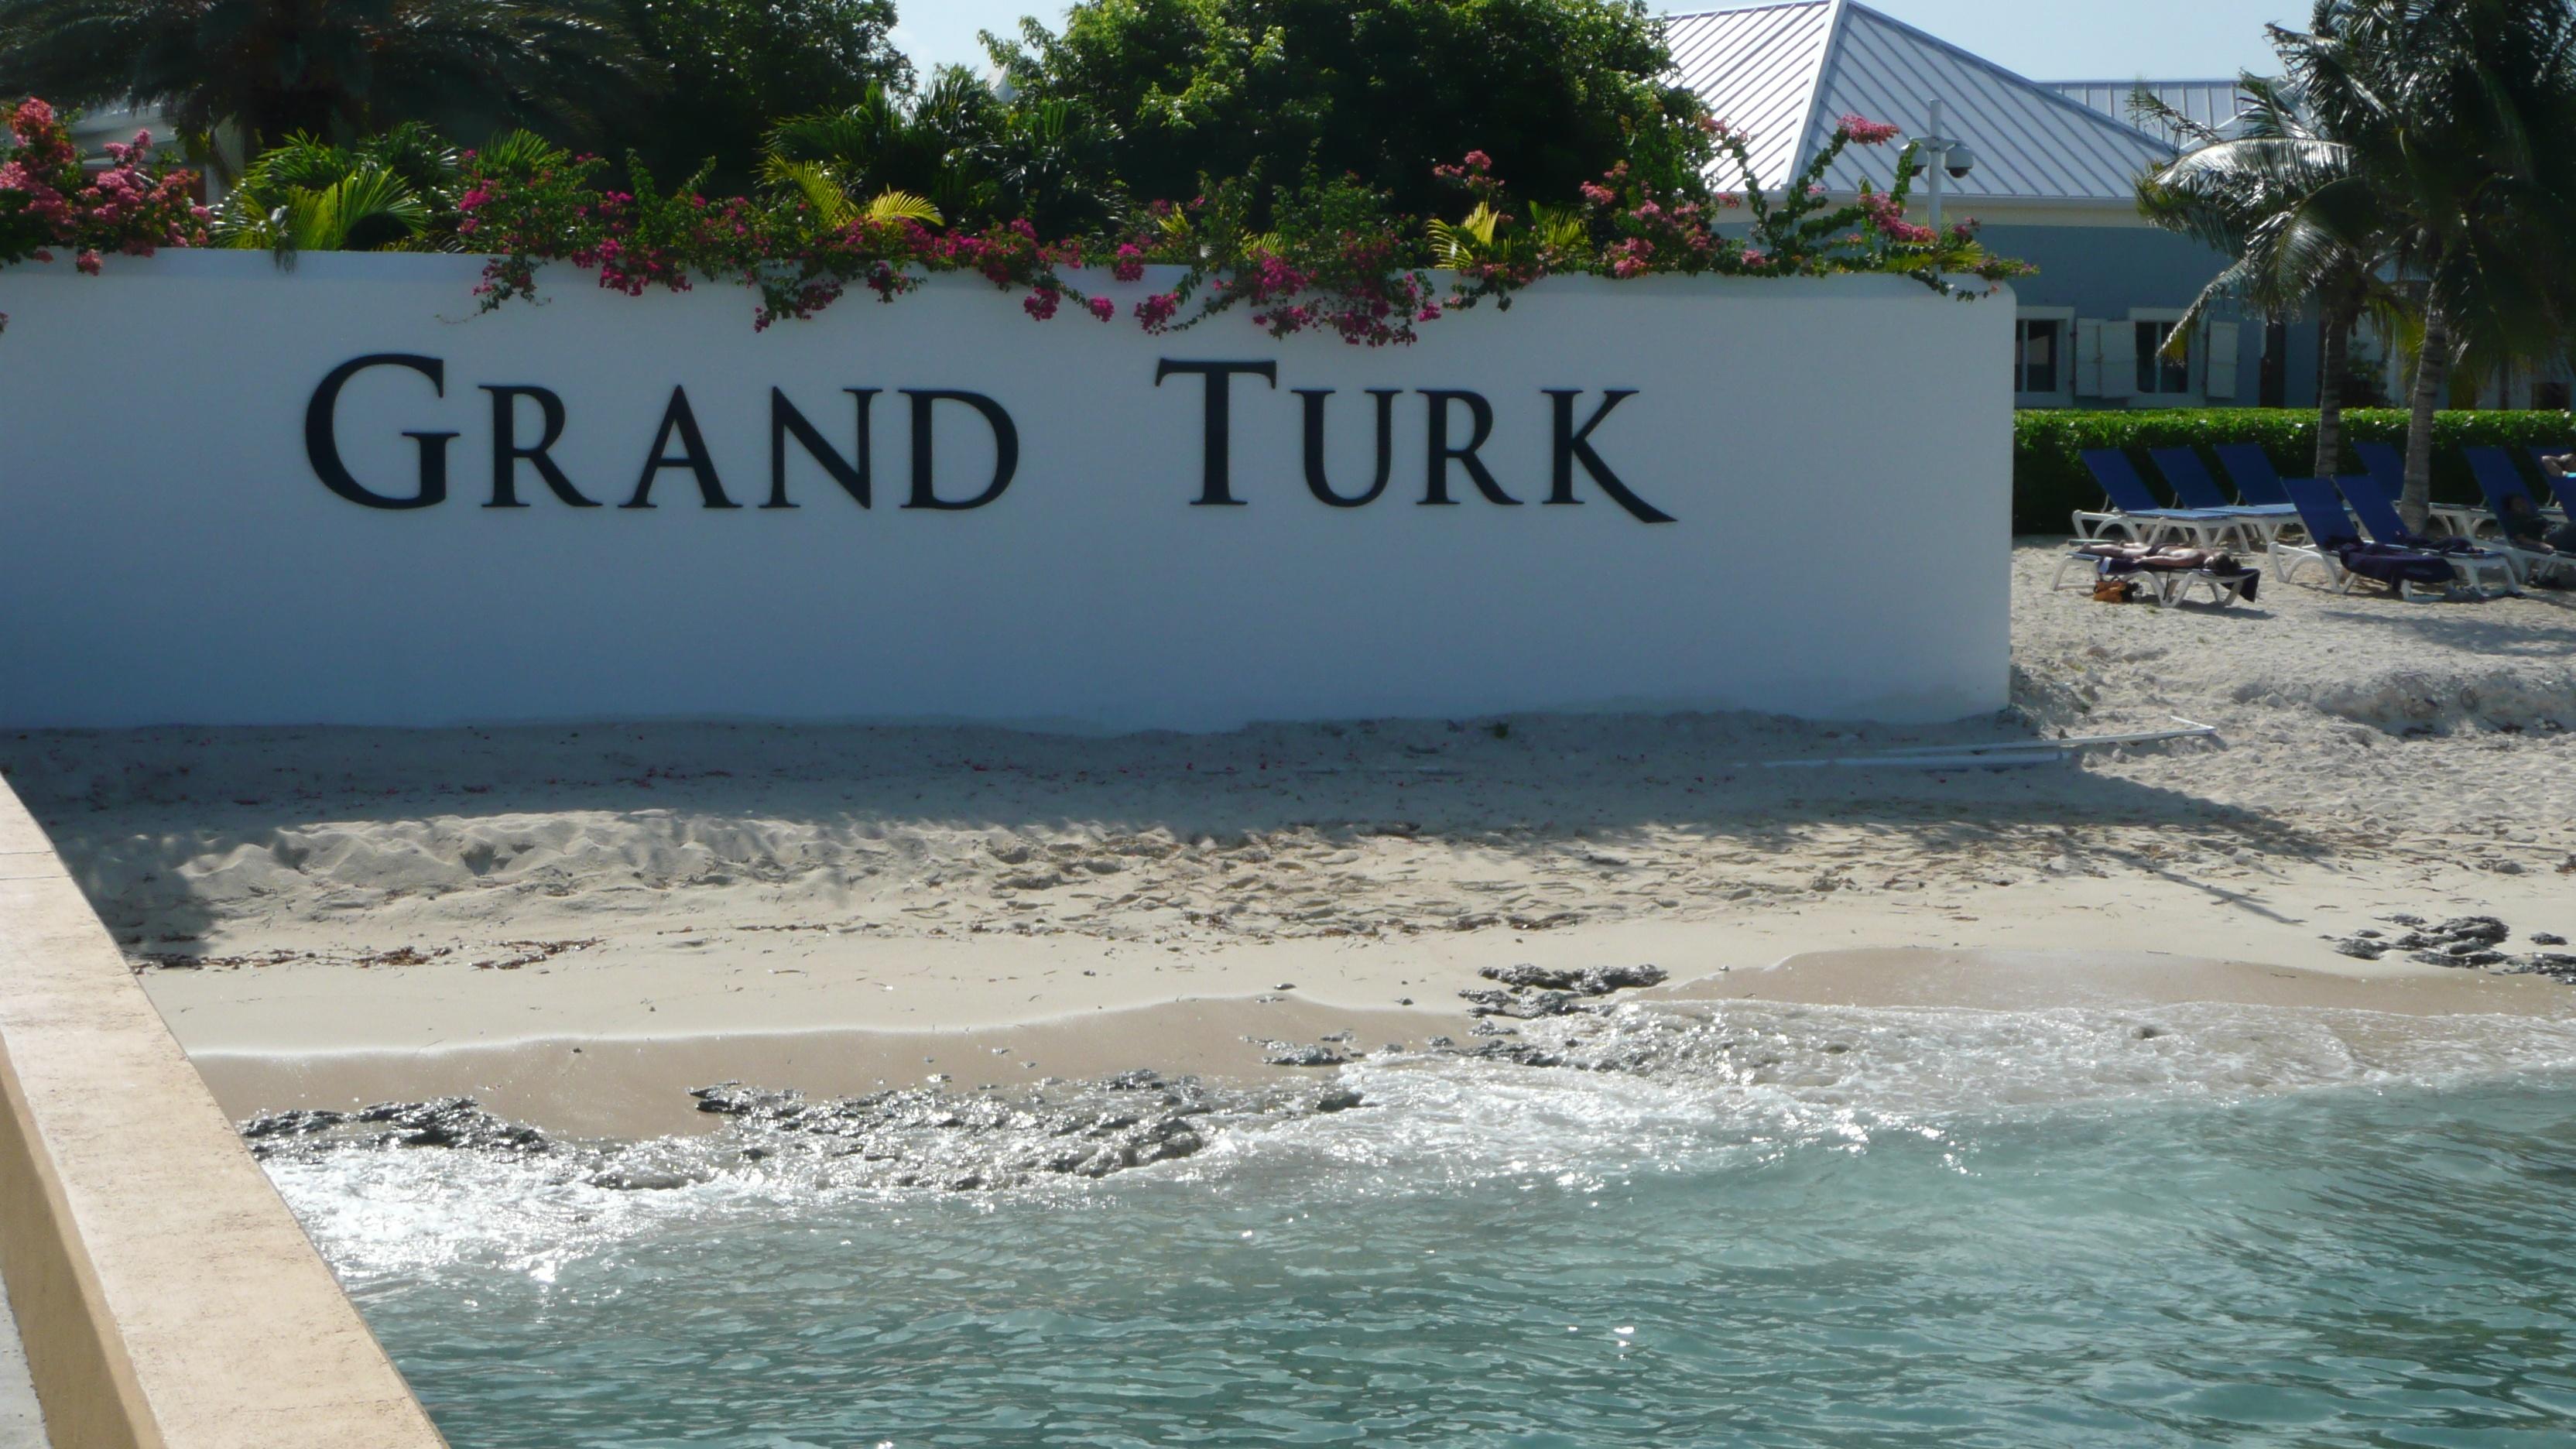 Grand Turk Turks And Caicos Islands Shore